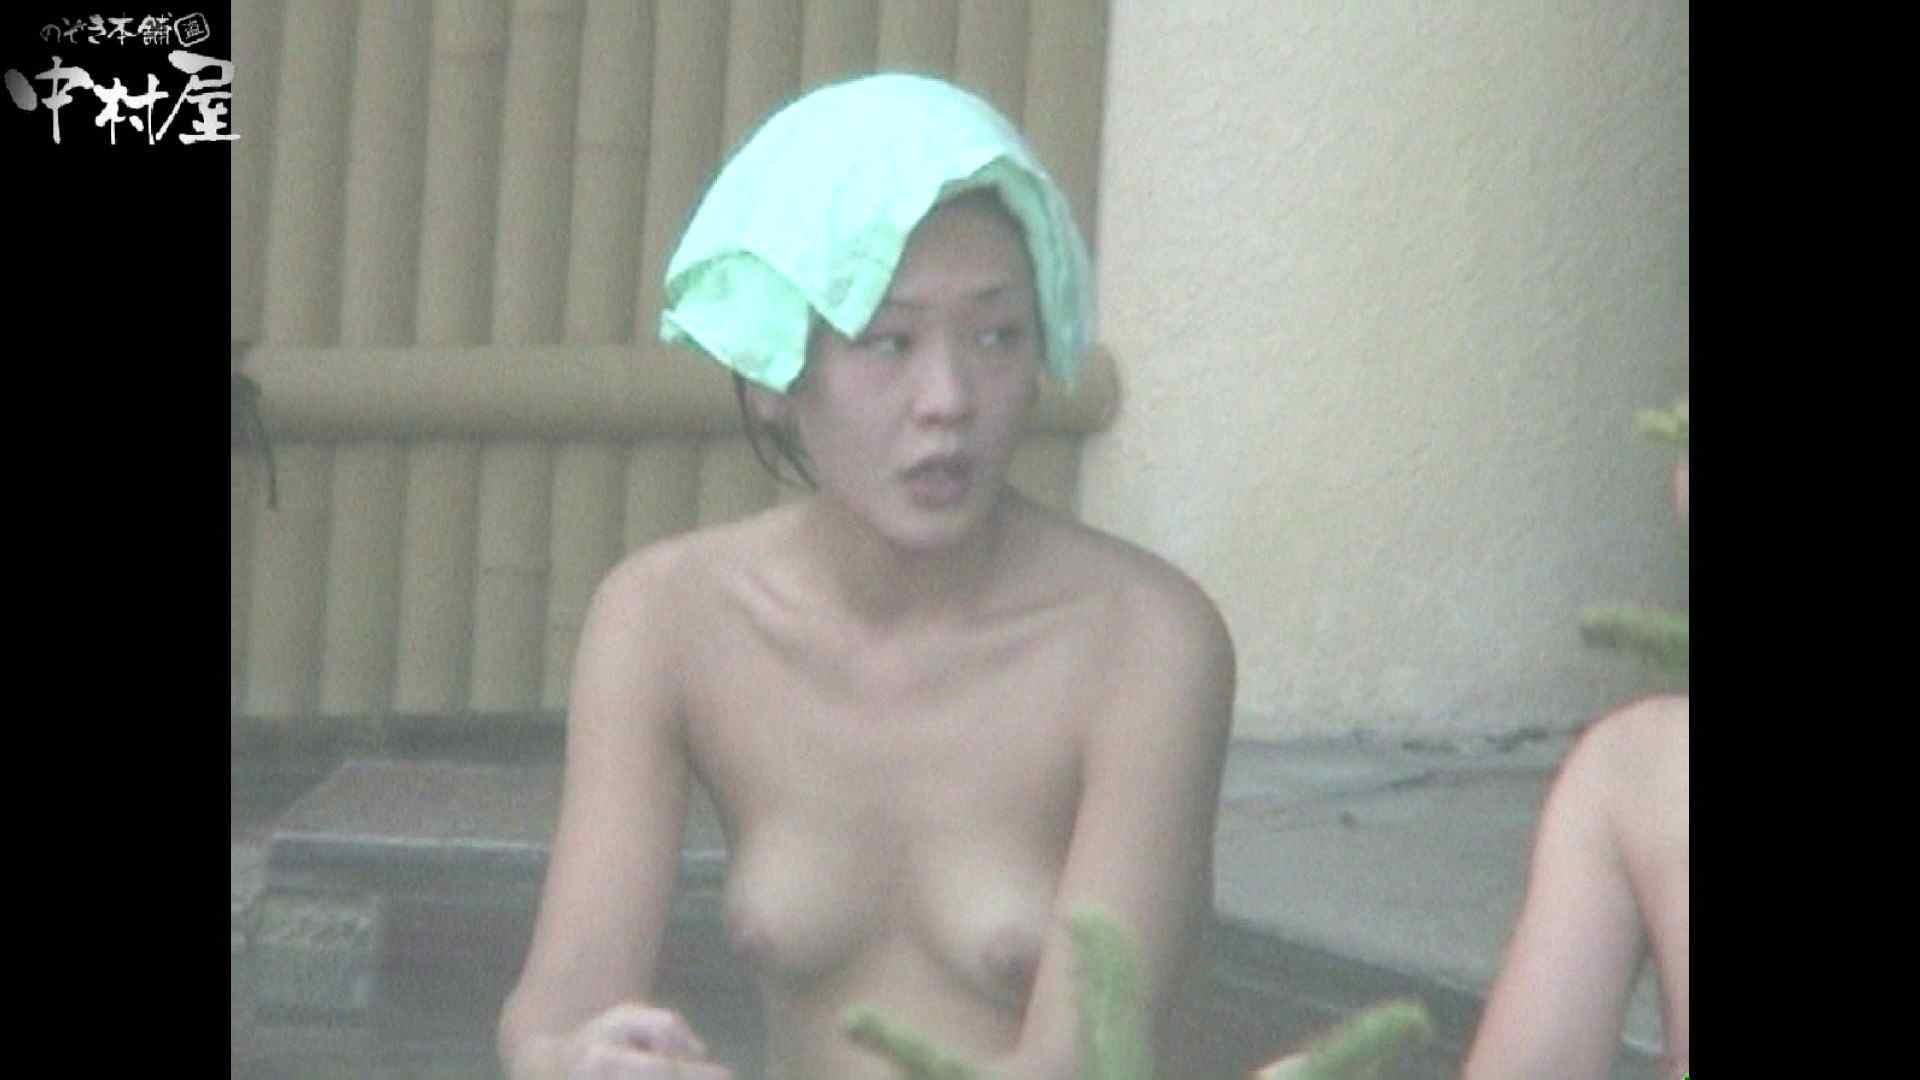 Aquaな露天風呂Vol.931 OLセックス 盗撮オマンコ無修正動画無料 67画像 26